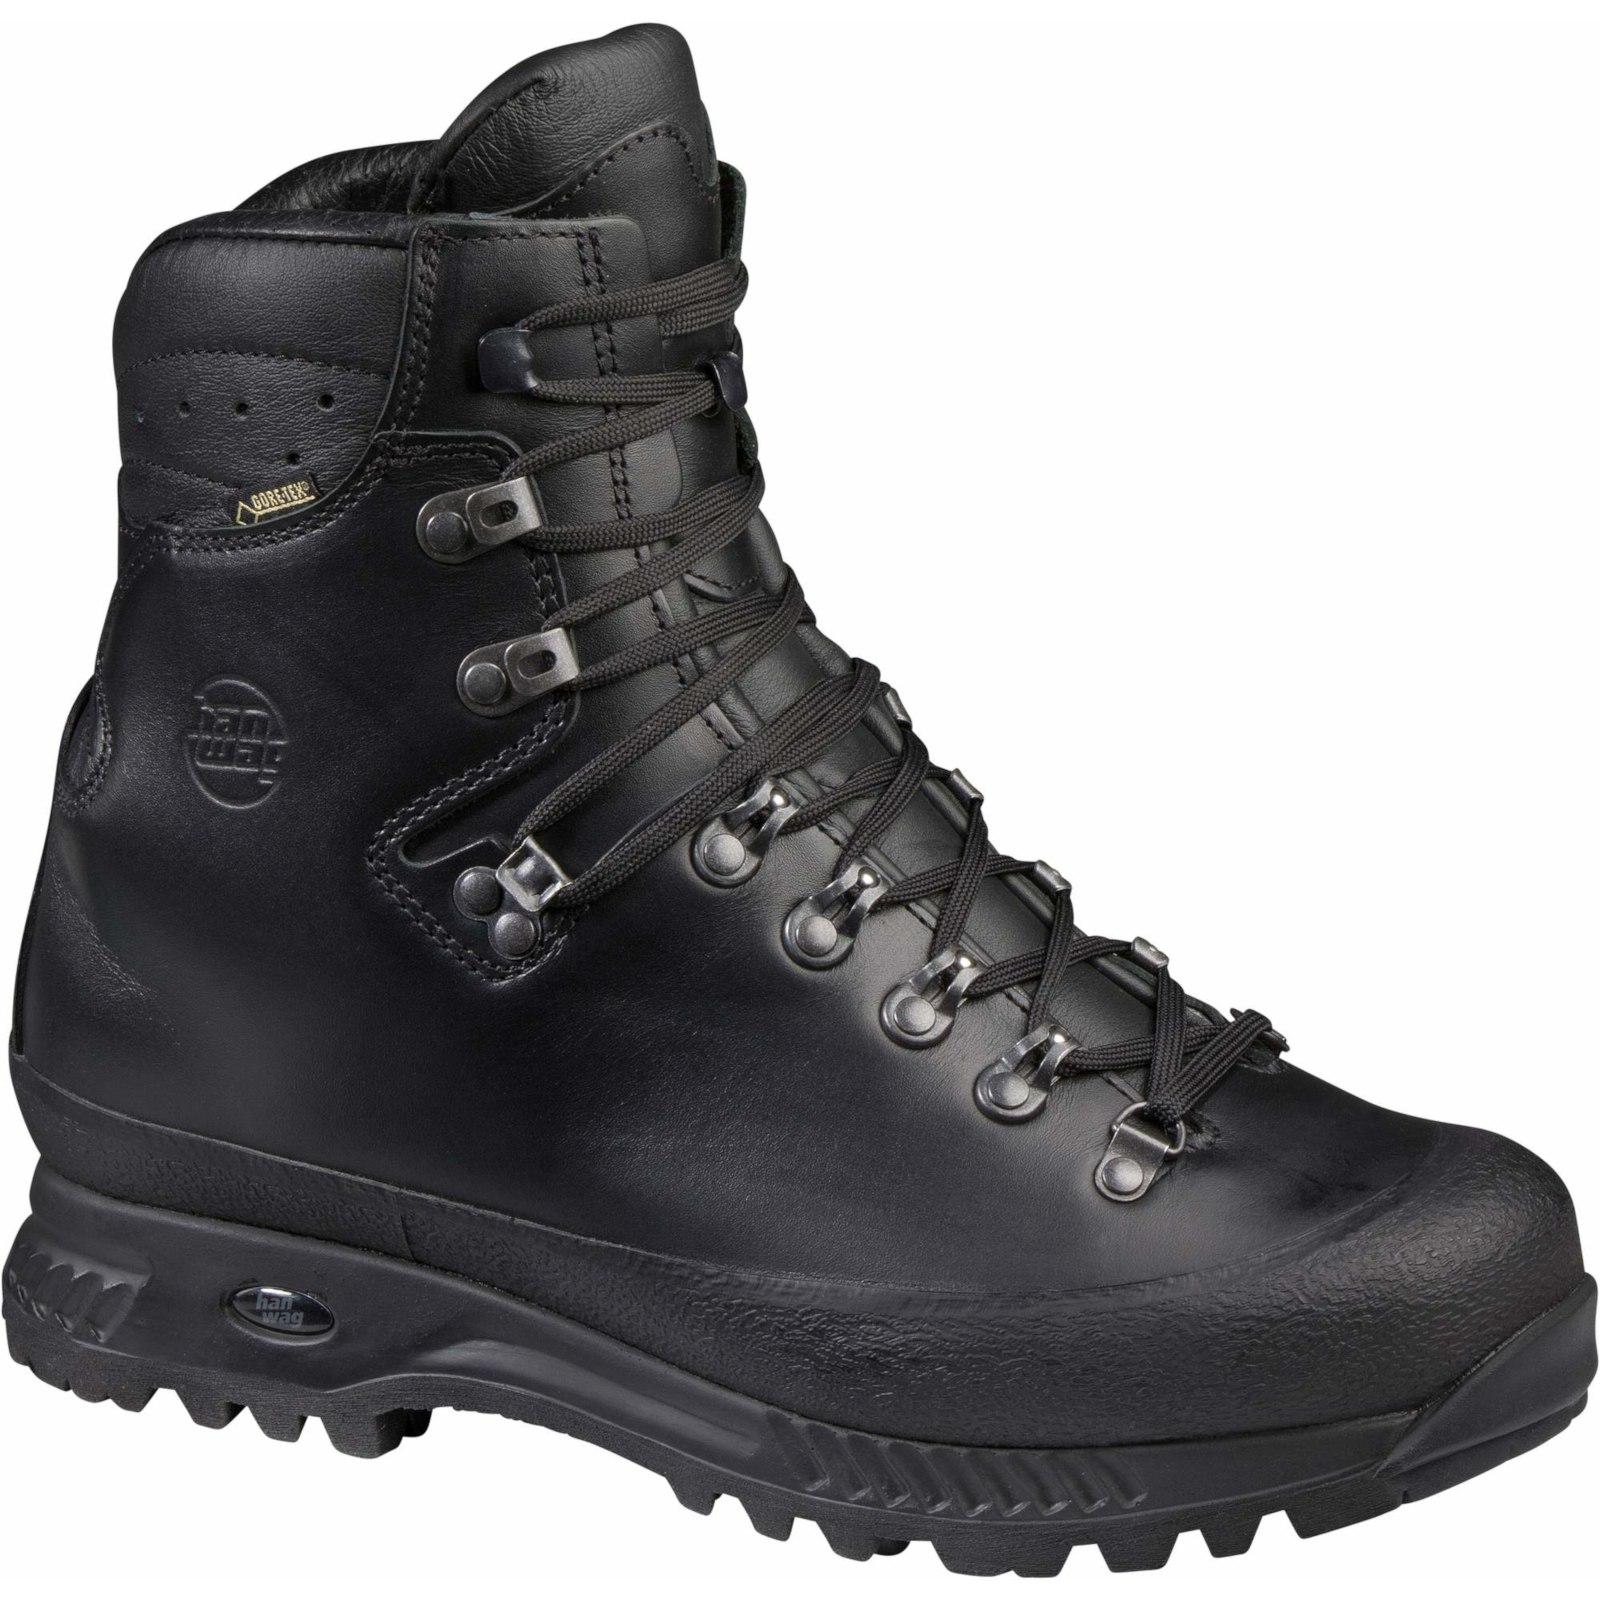 Hanwag Alaska GTX Shoe - Black